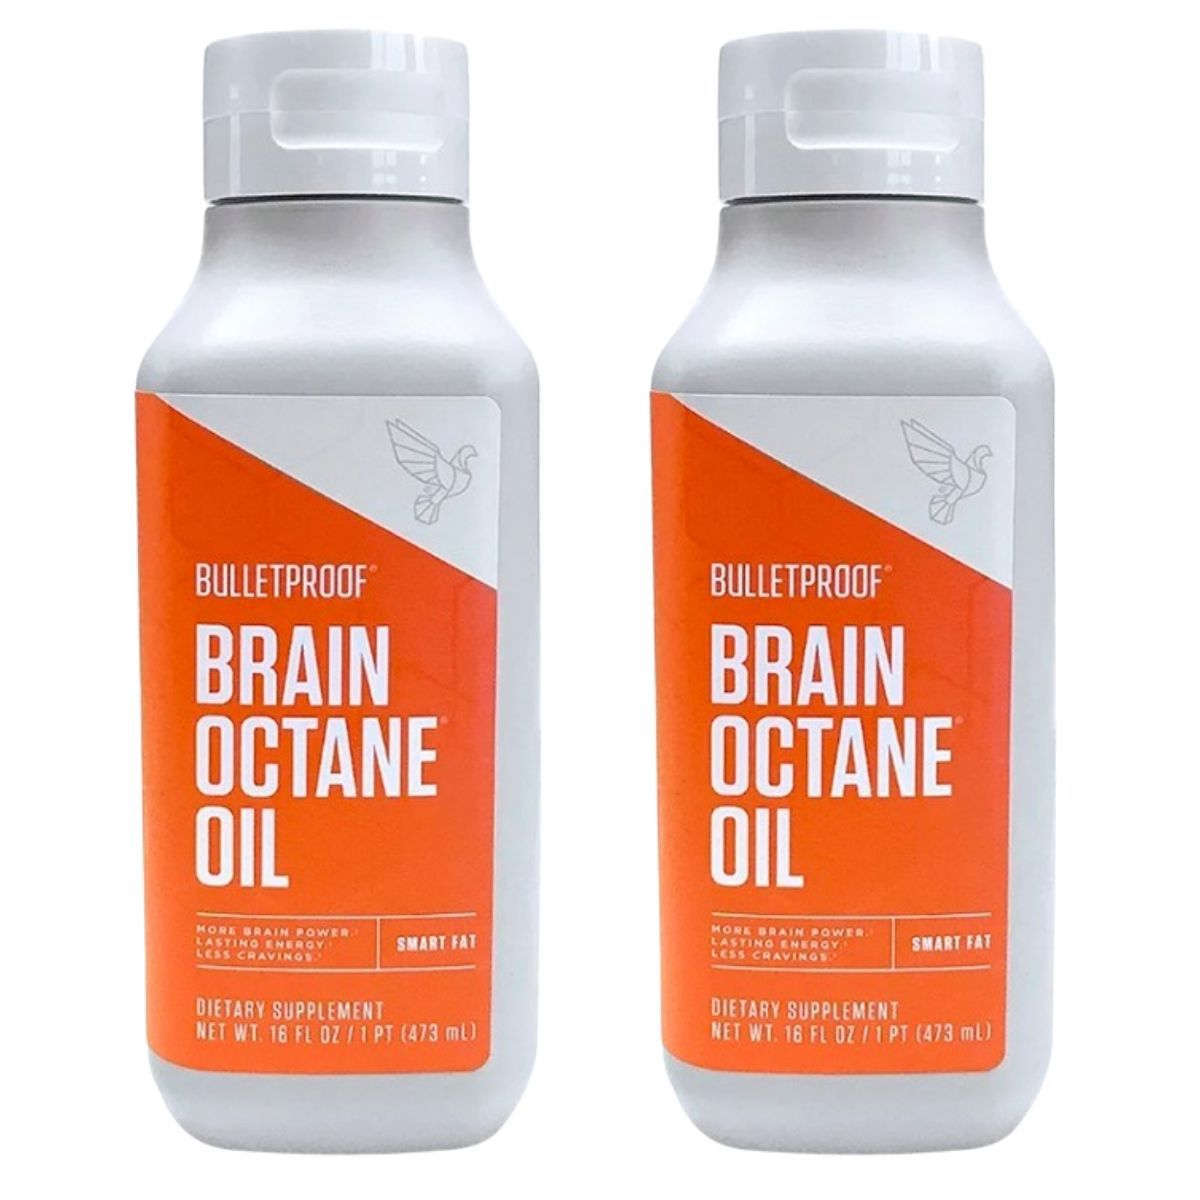 Kit 2 MCT Brain Octane Oil 473ml BulletProof - Óleo de Coco Concentrado